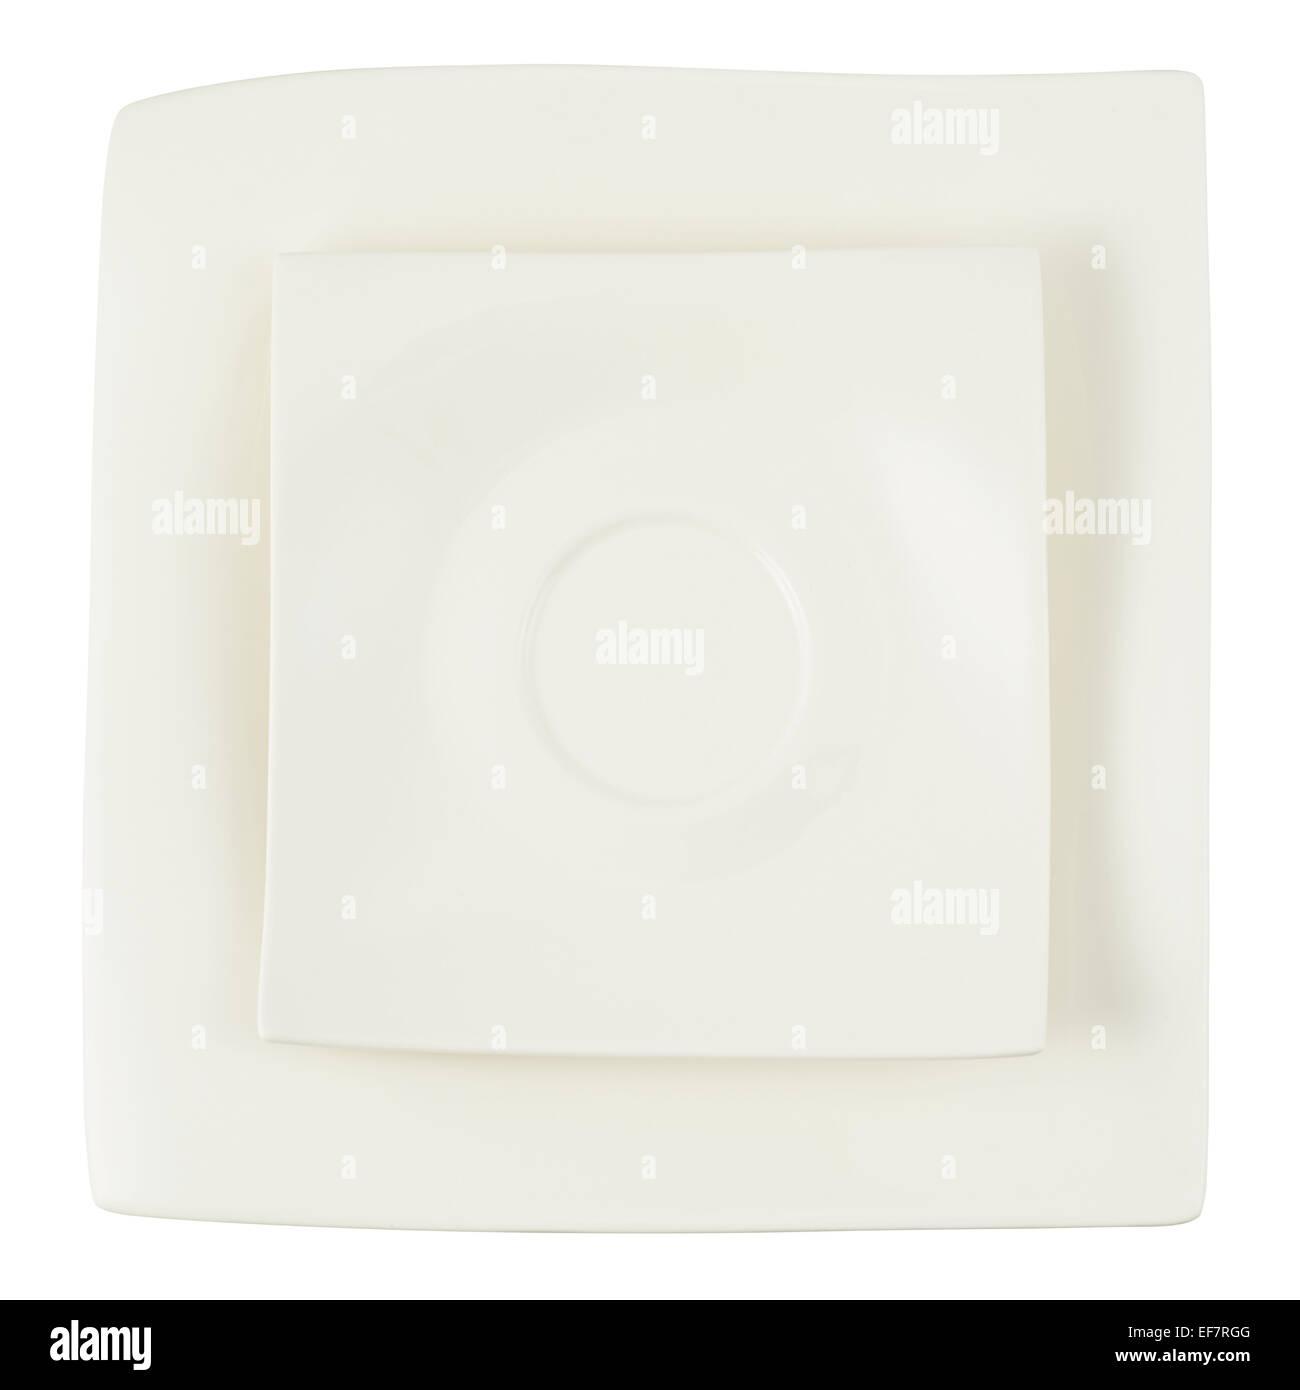 Two square ceramic plates composition  sc 1 st  Alamy & Two square ceramic plates composition Stock Photo: 78233472 - Alamy